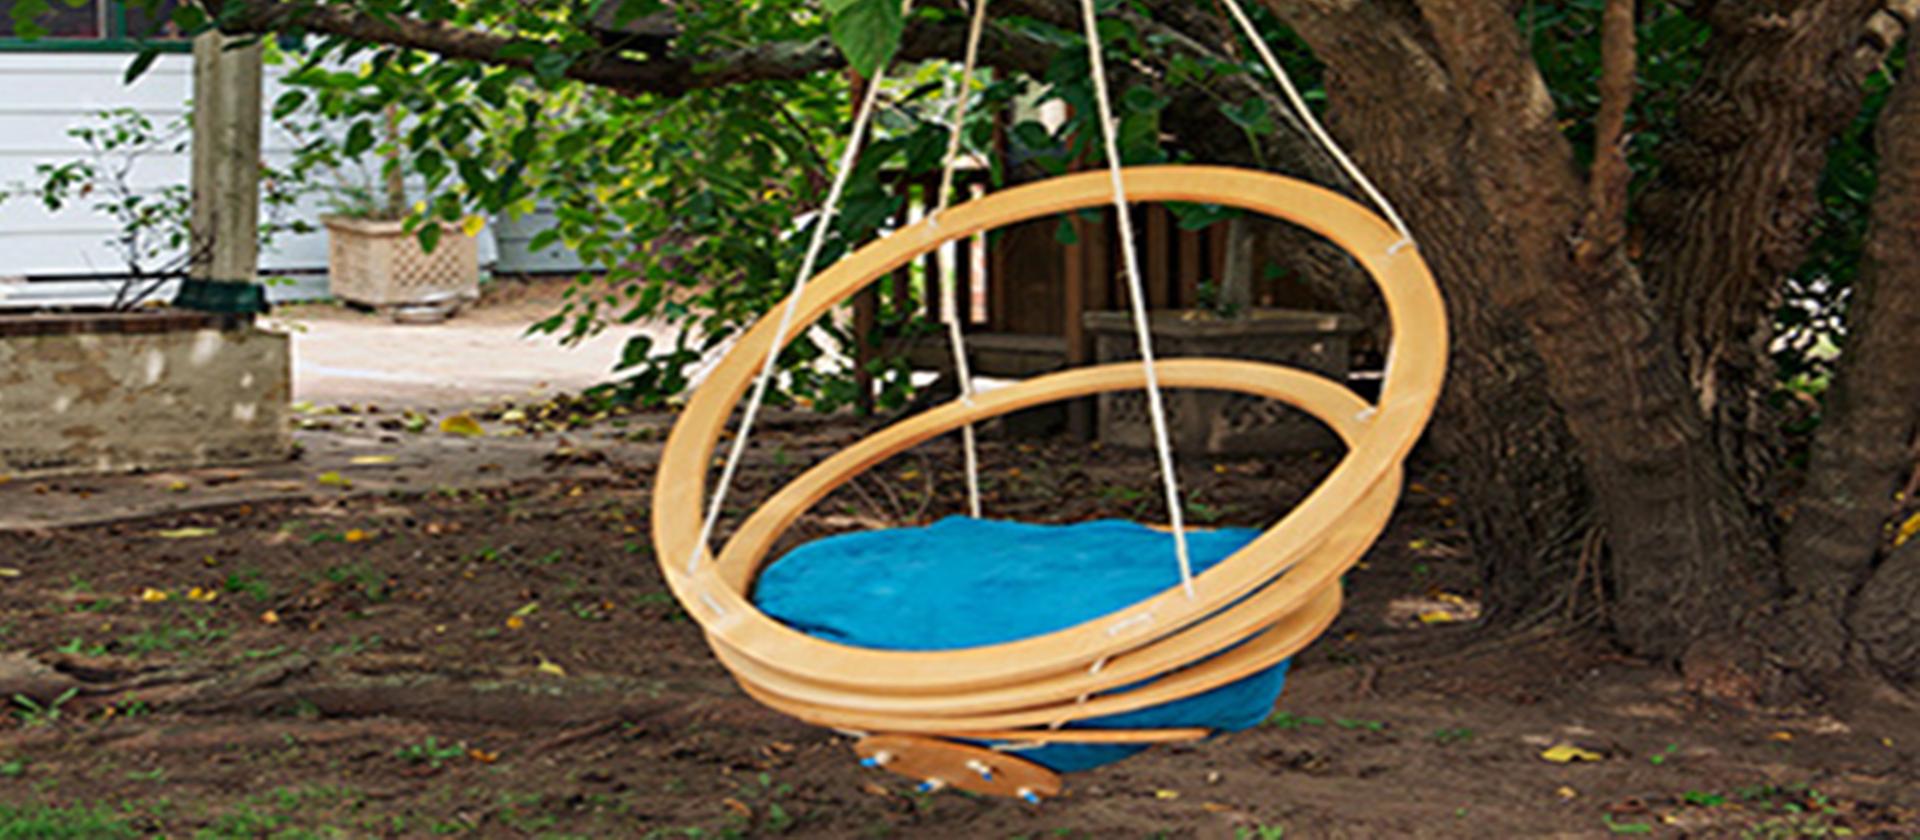 diy-swing-sets-1